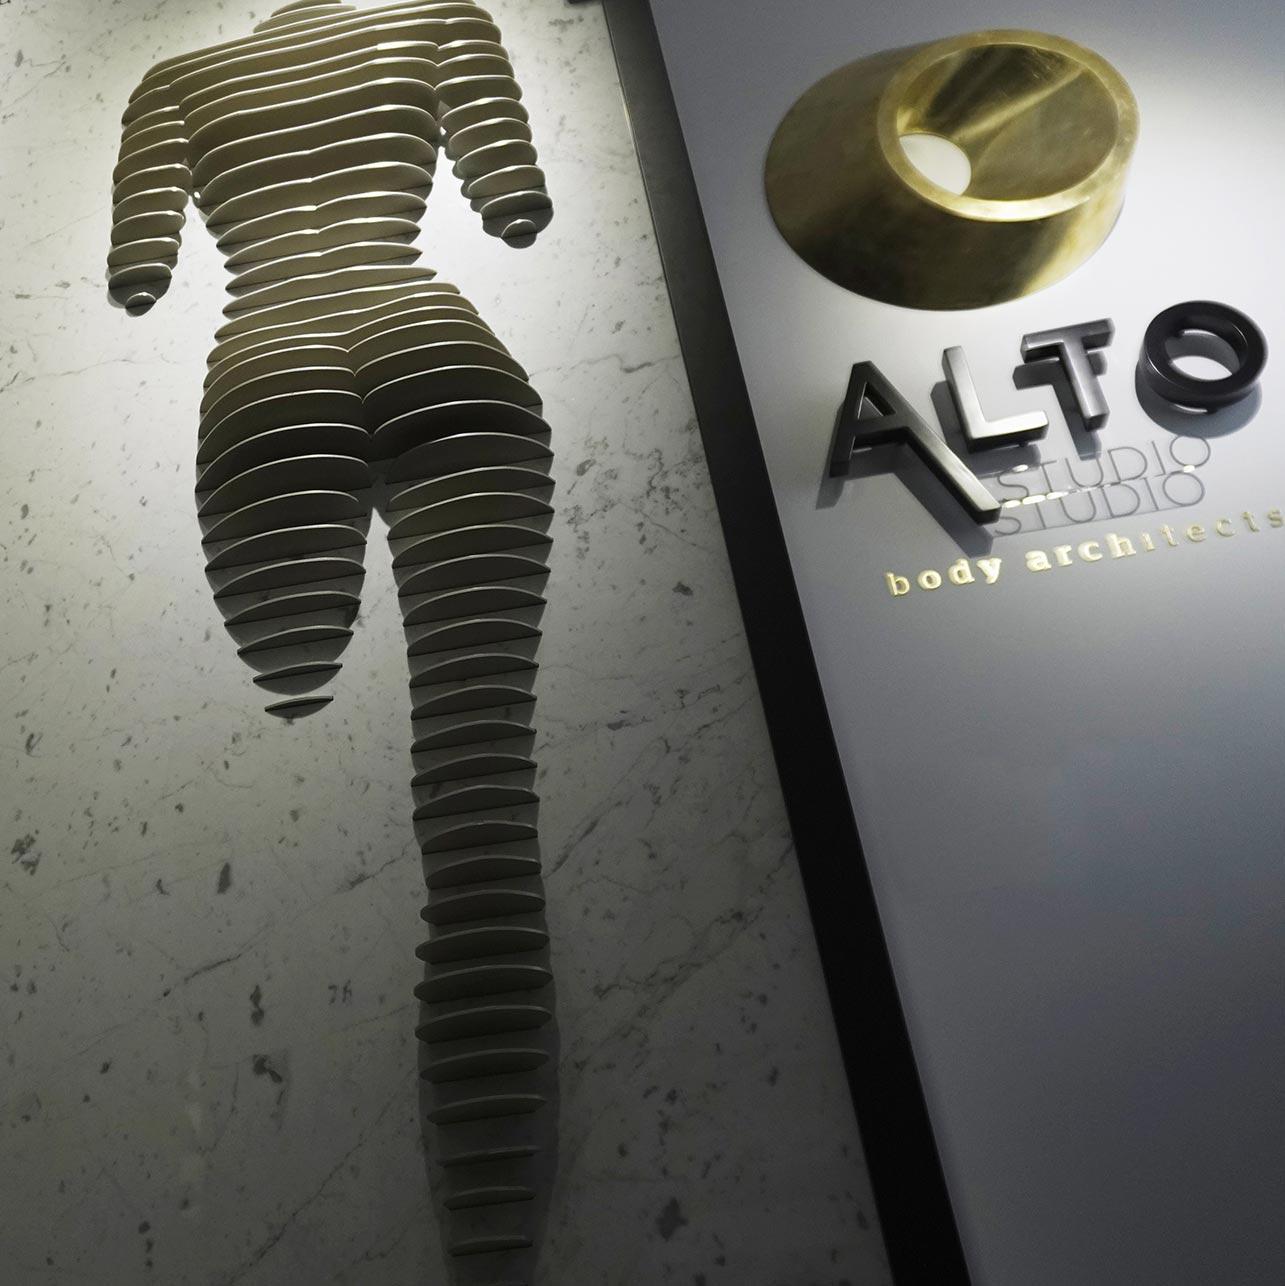 arhitectura corporala silueta 3d si logo